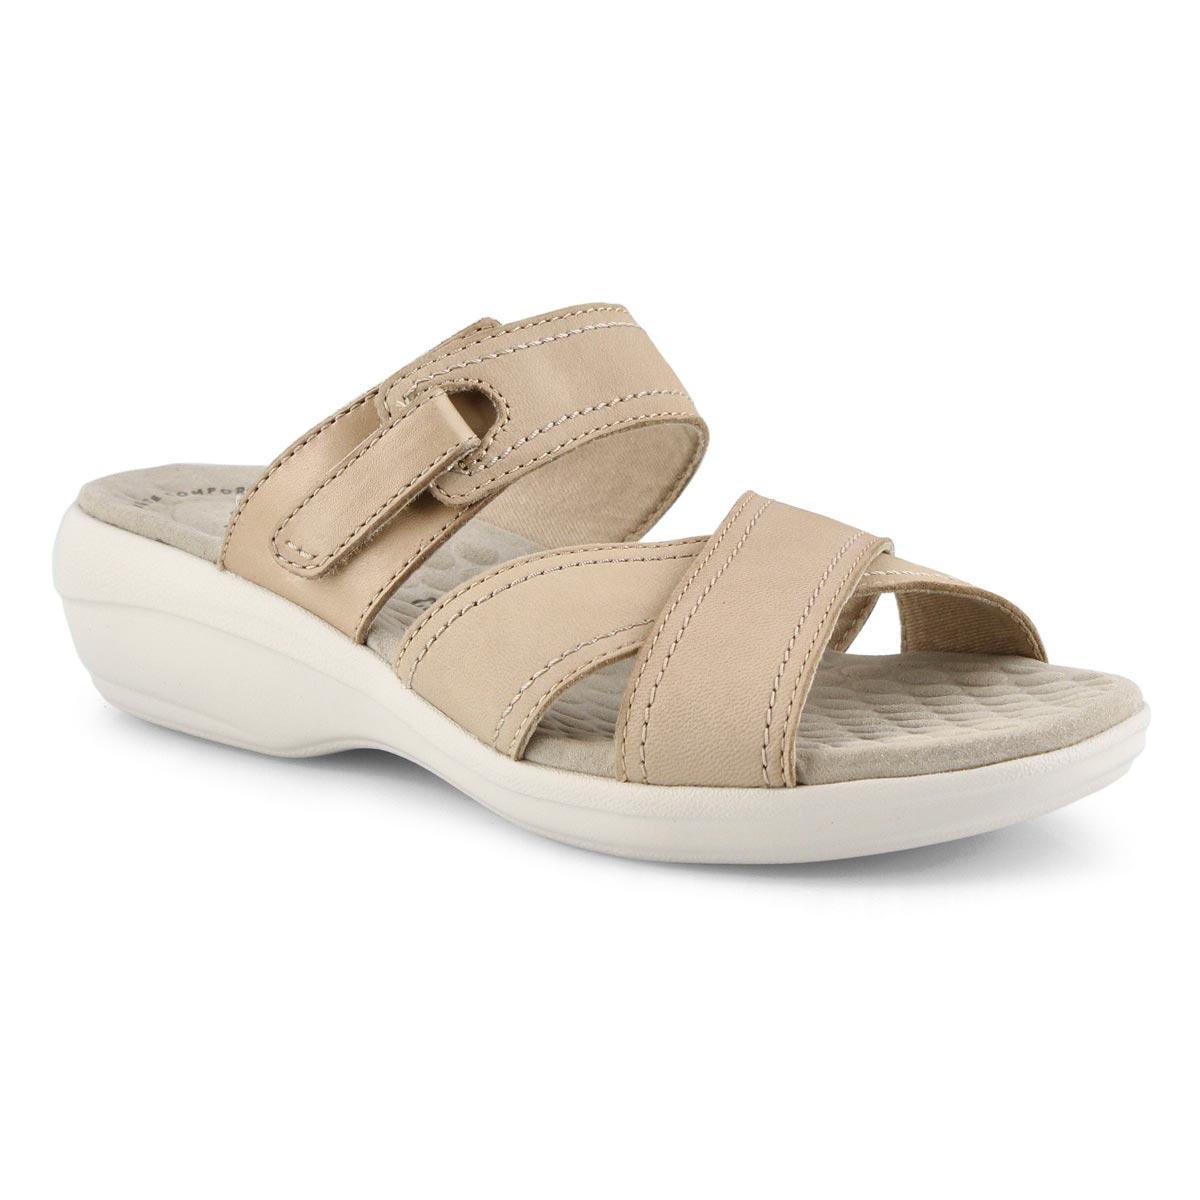 Lds Alexis Art sand casual slide sandal